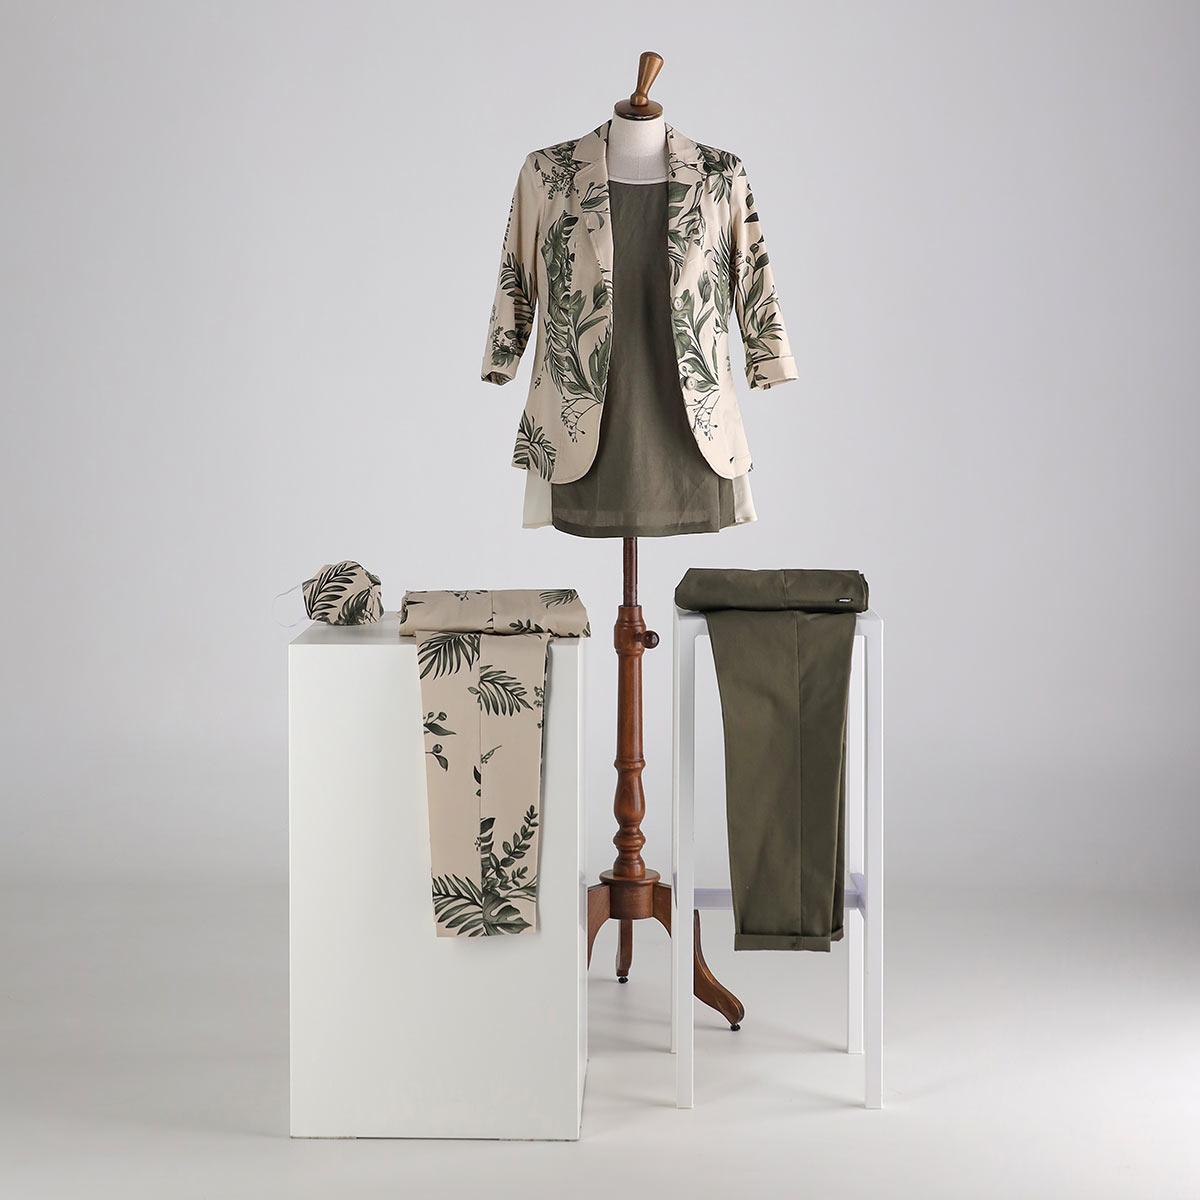 Giacca e pantalone in cotone fantasia. Camicia in tinta unica e pantalone tinta unica estate 2020 Meteore Fashion